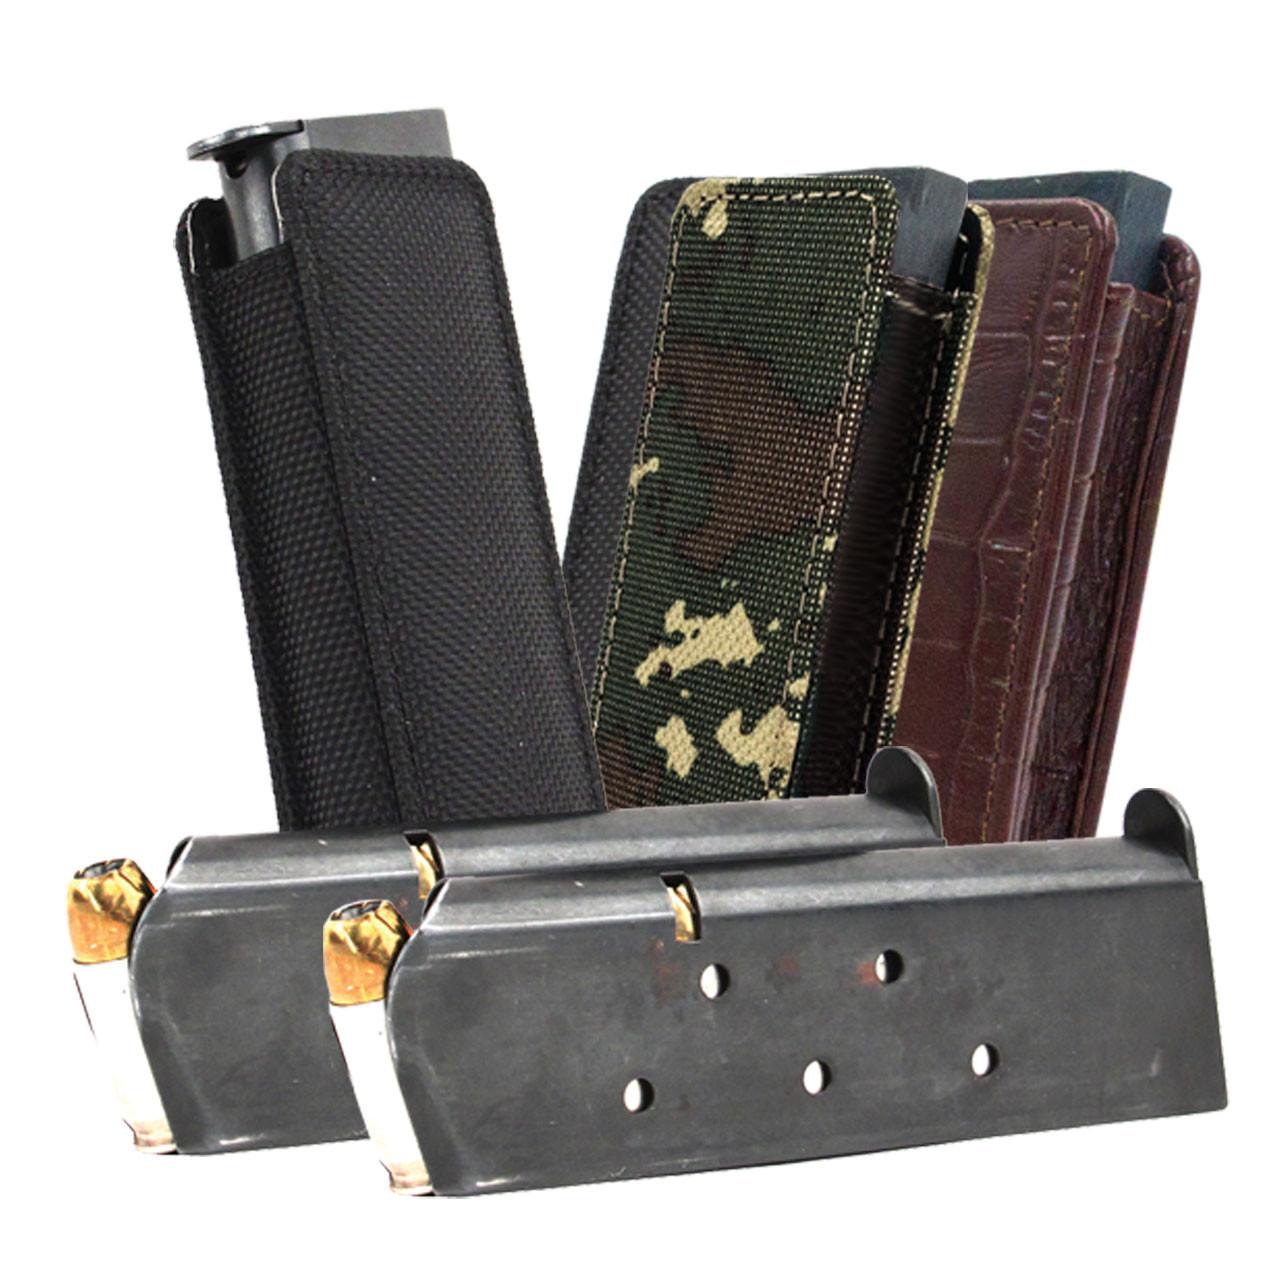 Sig Sauer 1911 Compact Magazine Pocket Protector